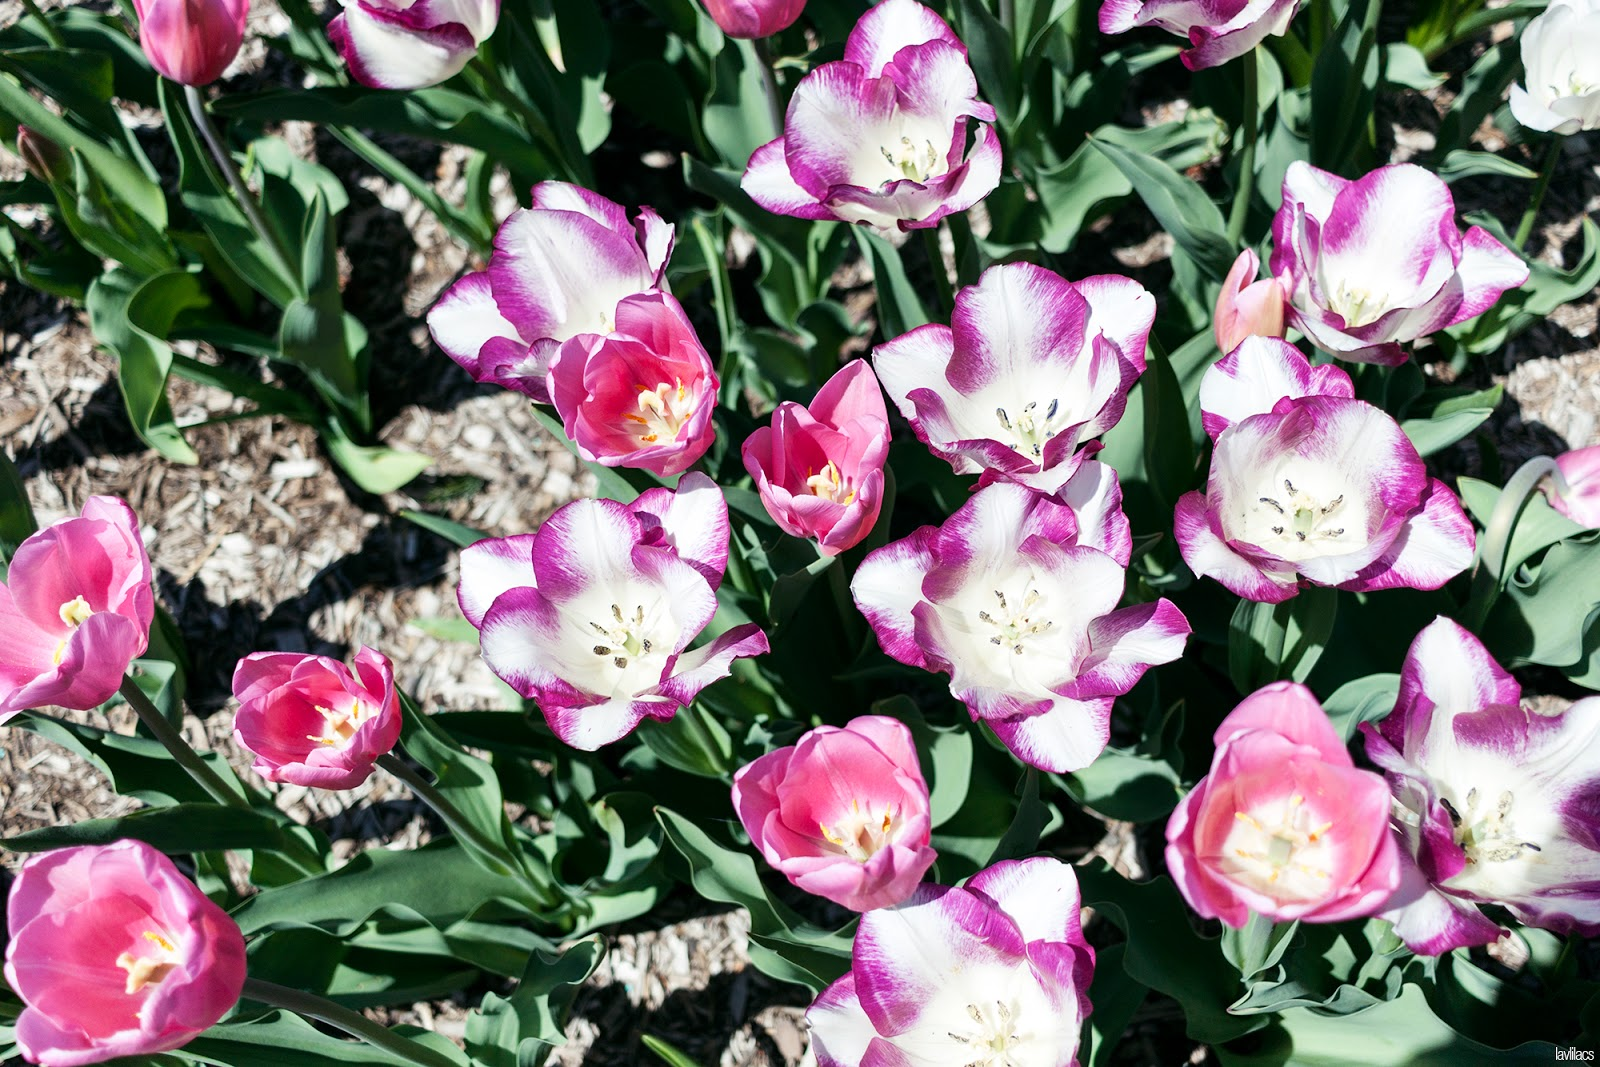 Brooklyn Botanic Garden - Pink and Magenta Tulips